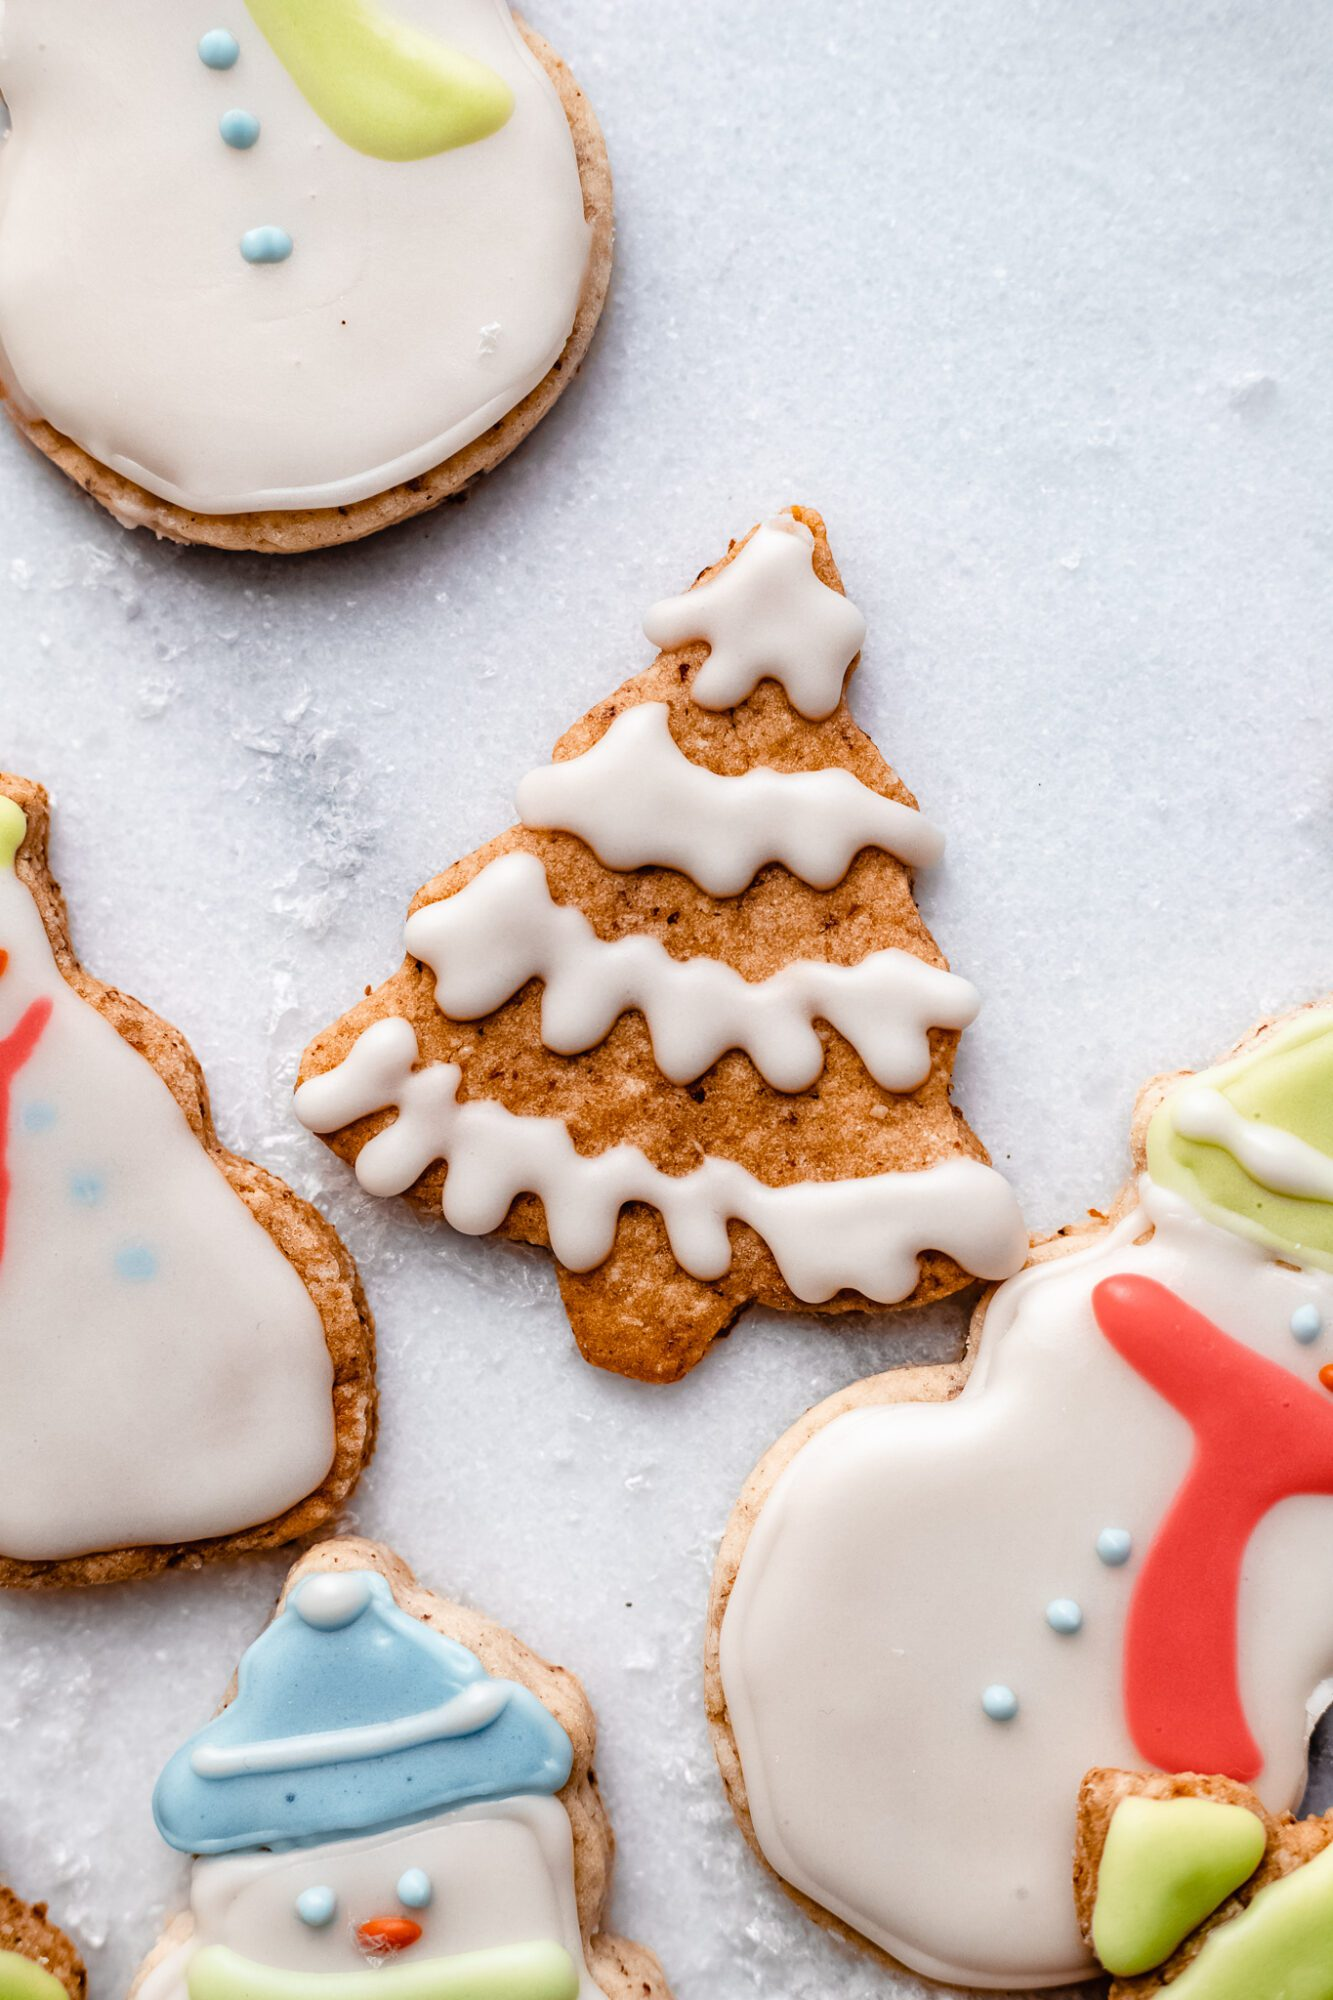 Vegan Royal Icing How To Decorate Sugar Cookies The Banana Diaries